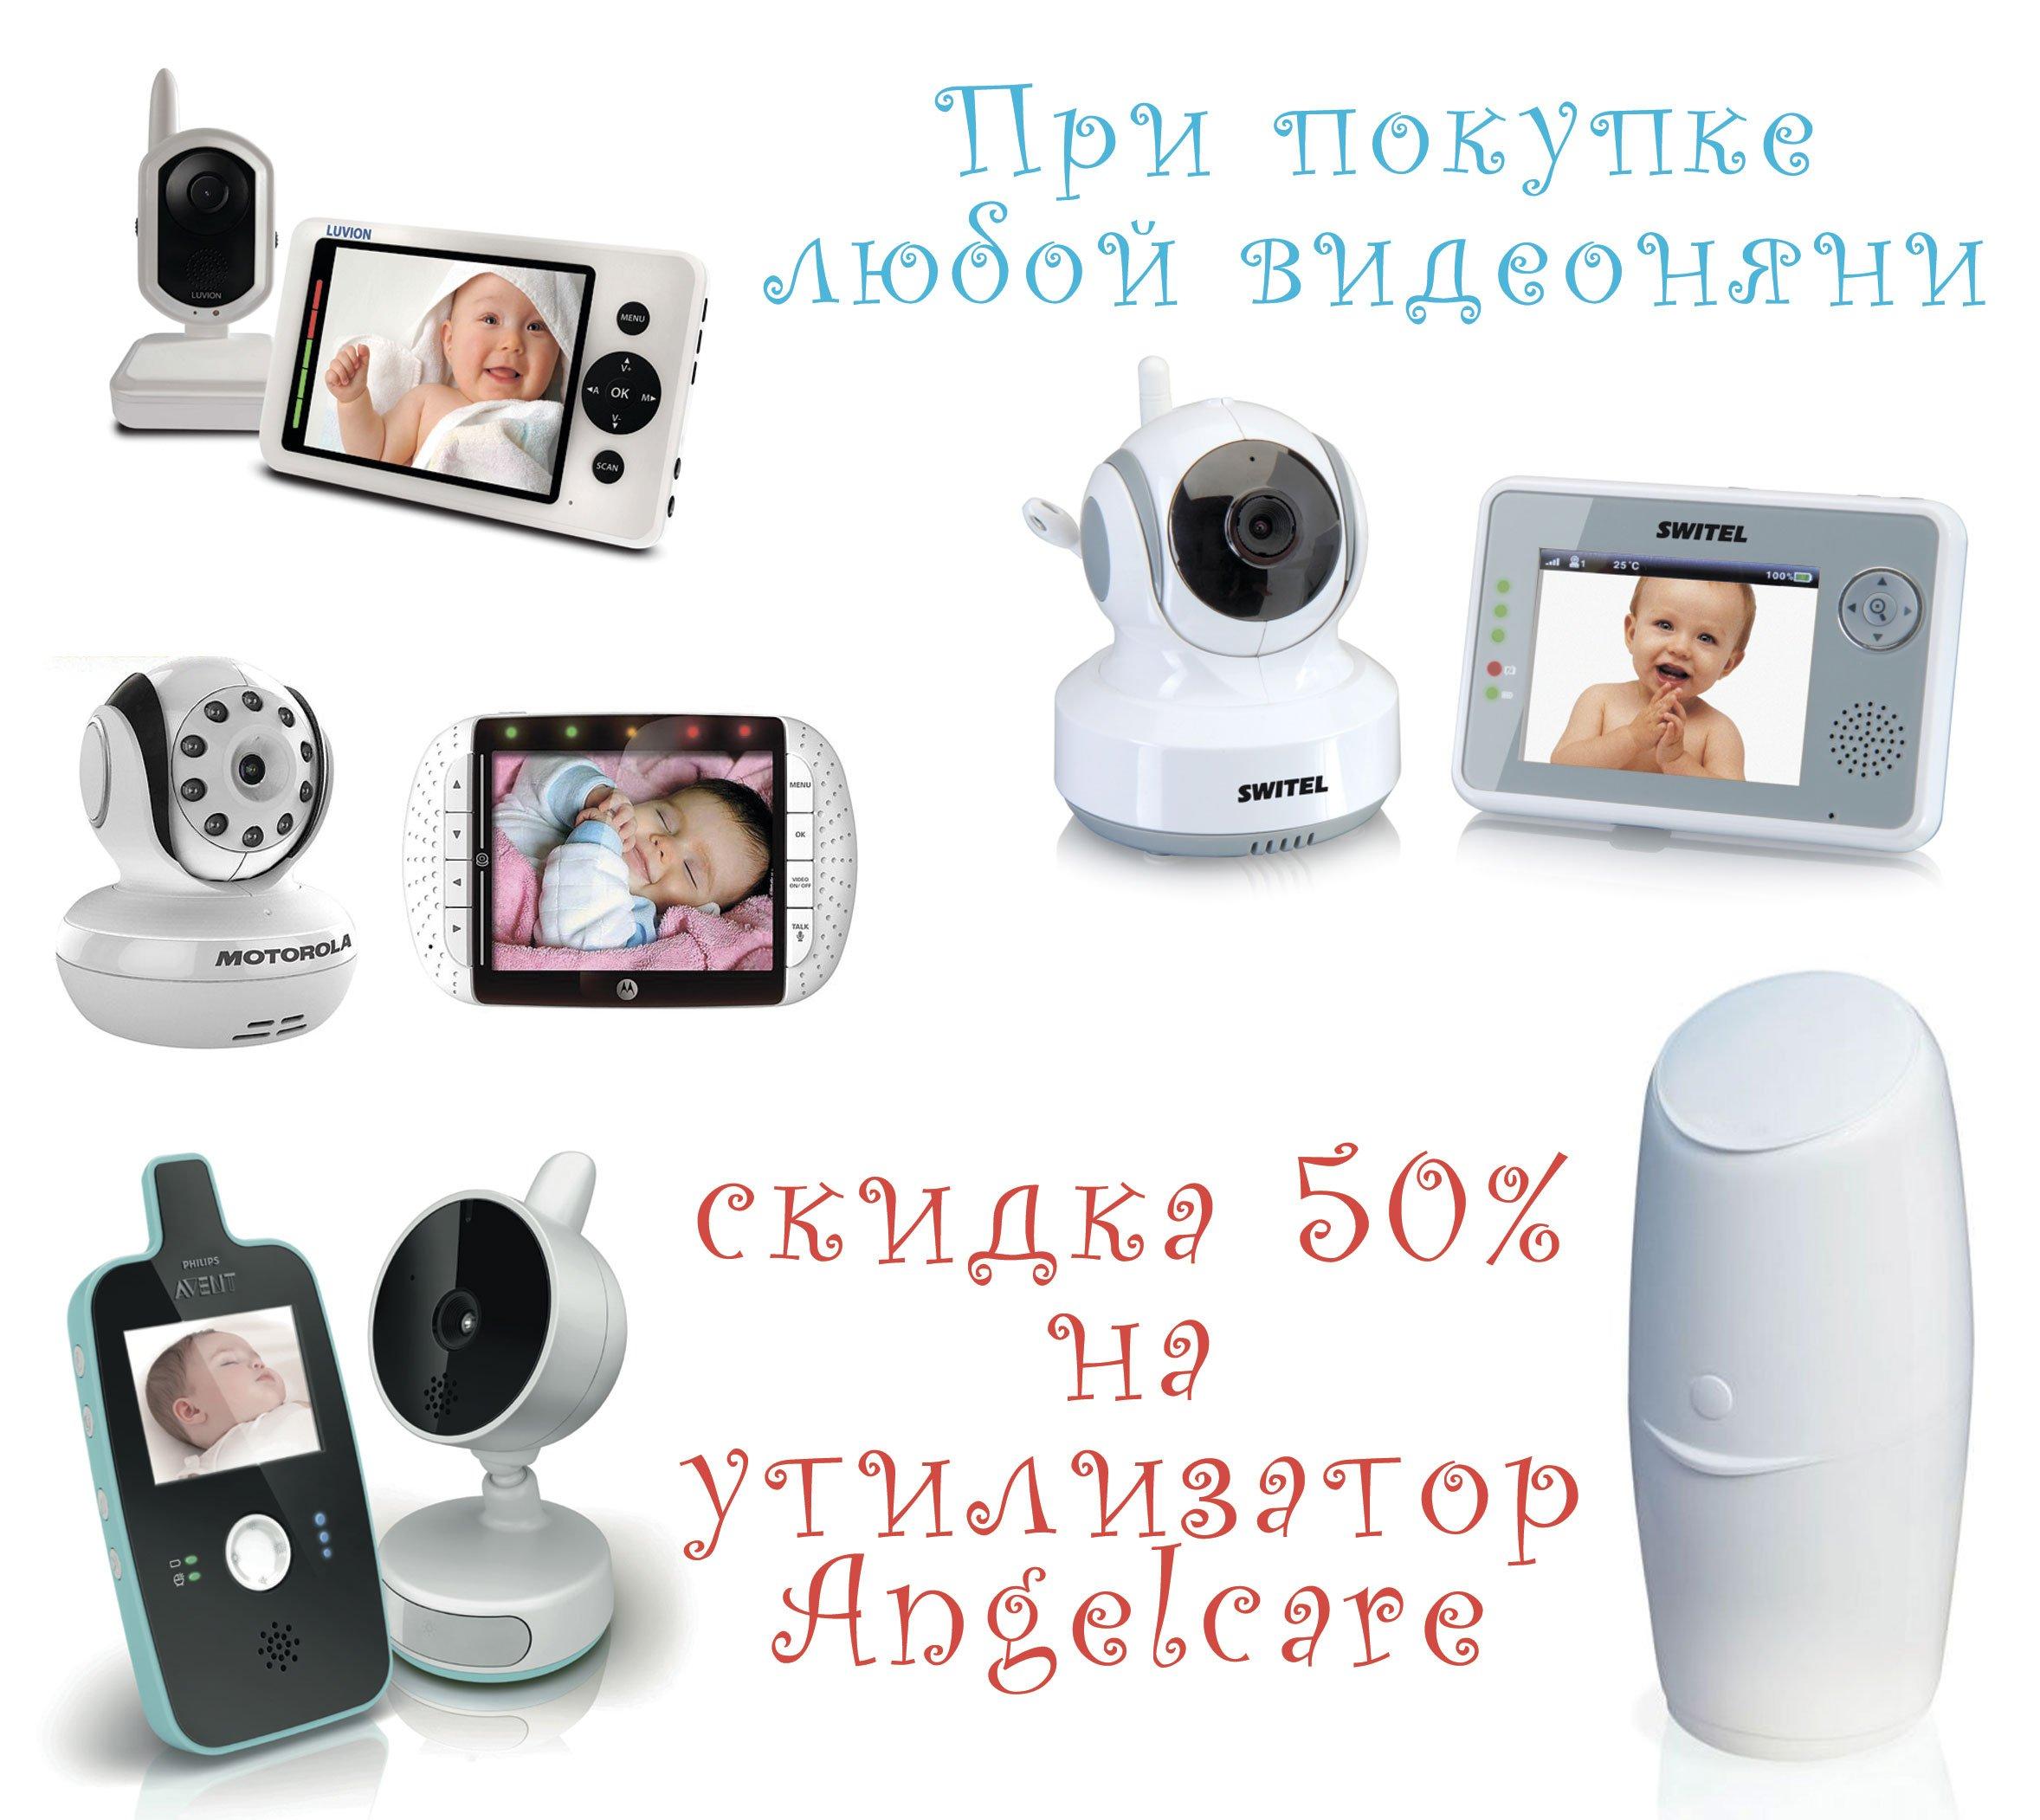 http://kinderone.ru/images/upload/Без-имени-1.jpg